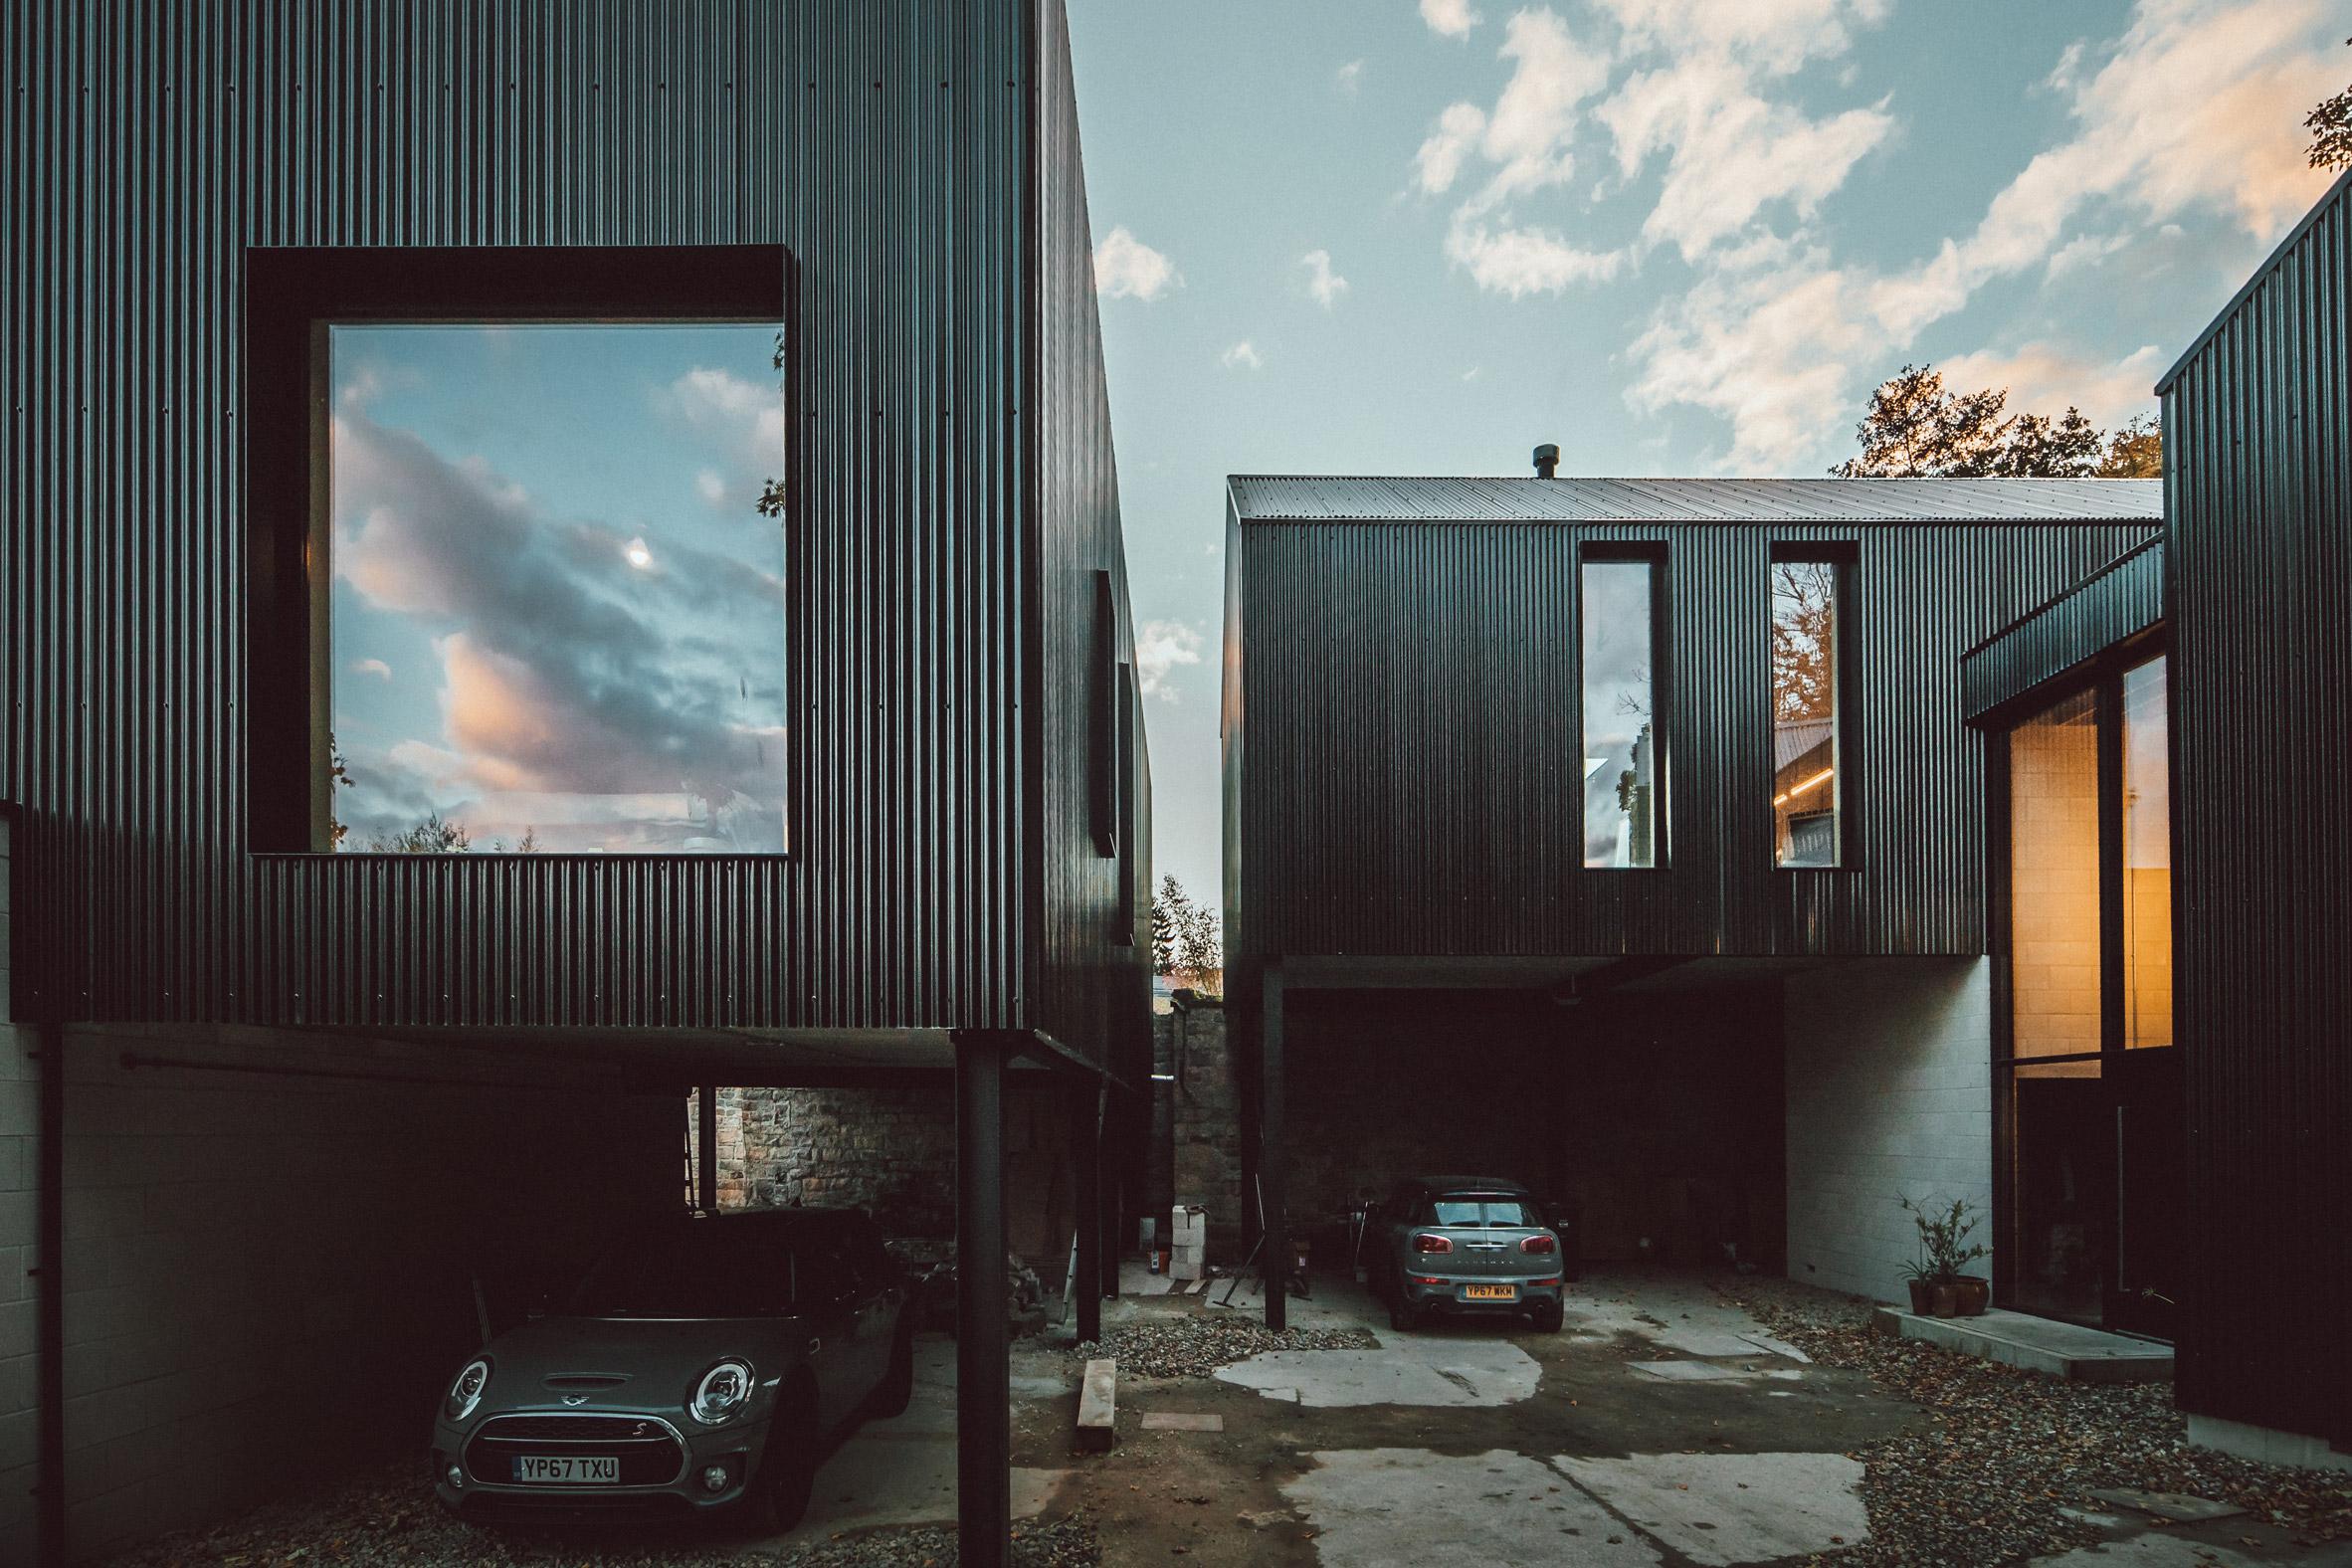 twin-build-nik-jon-draughty-coda-architectur-residential-bespoke-black-metal-house-sheffield-uk-_dezeen_2364_col_77.jpg